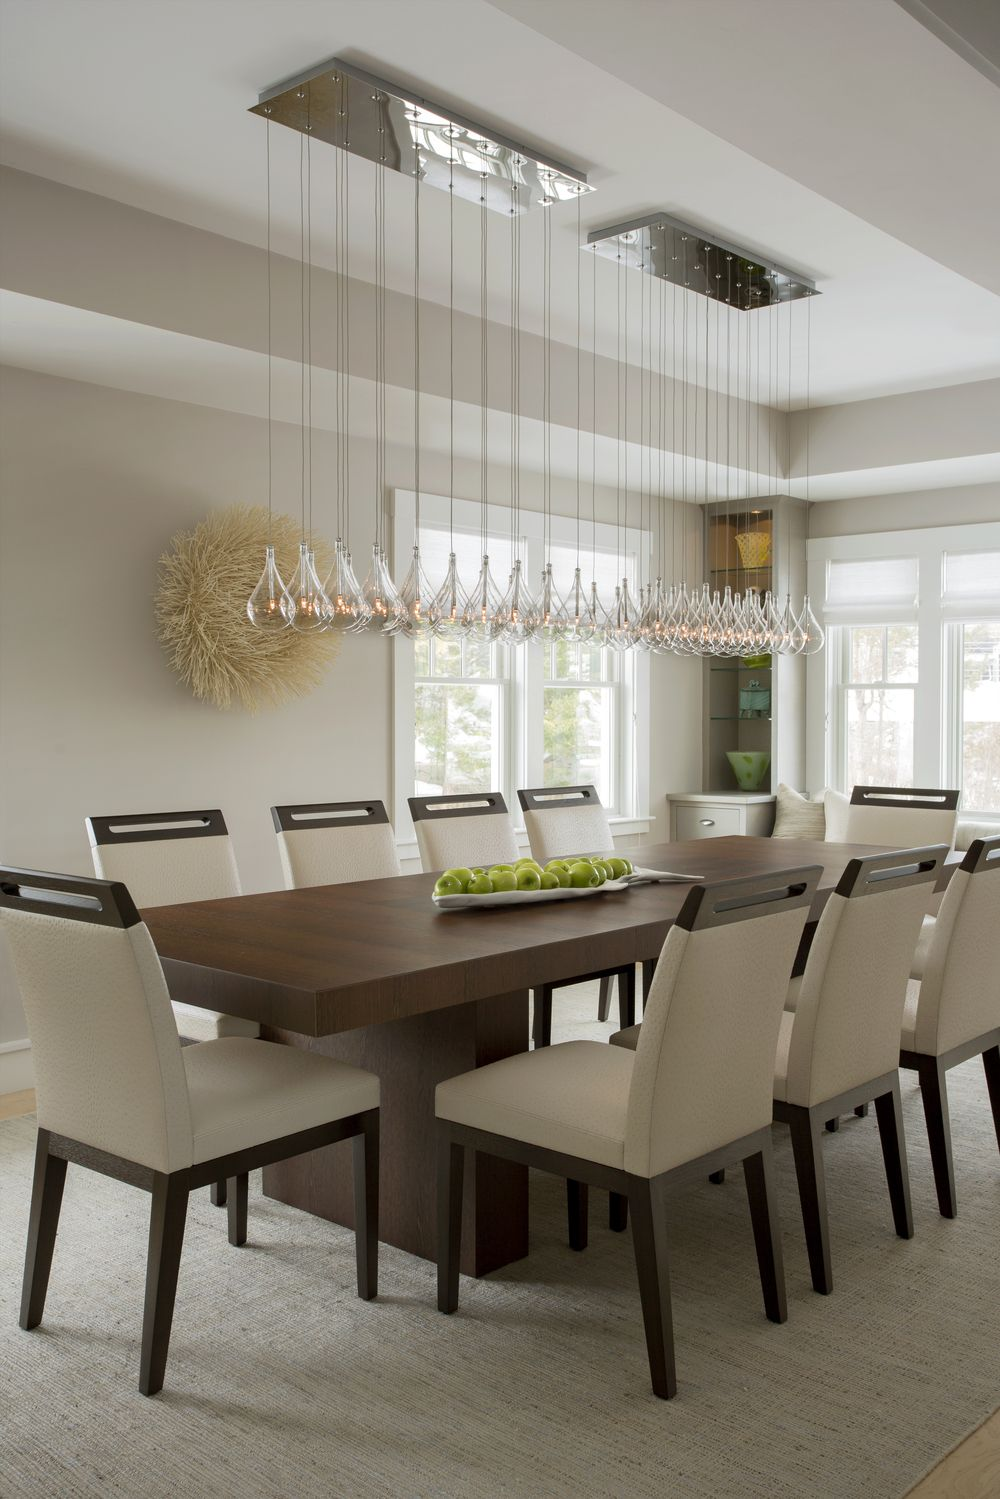 Contemporary Dining Room Tables And Chairs Enchanting Liz Stiving Nicholas 3 10 15 Diningrm 2  Coastal Living Design Inspiration